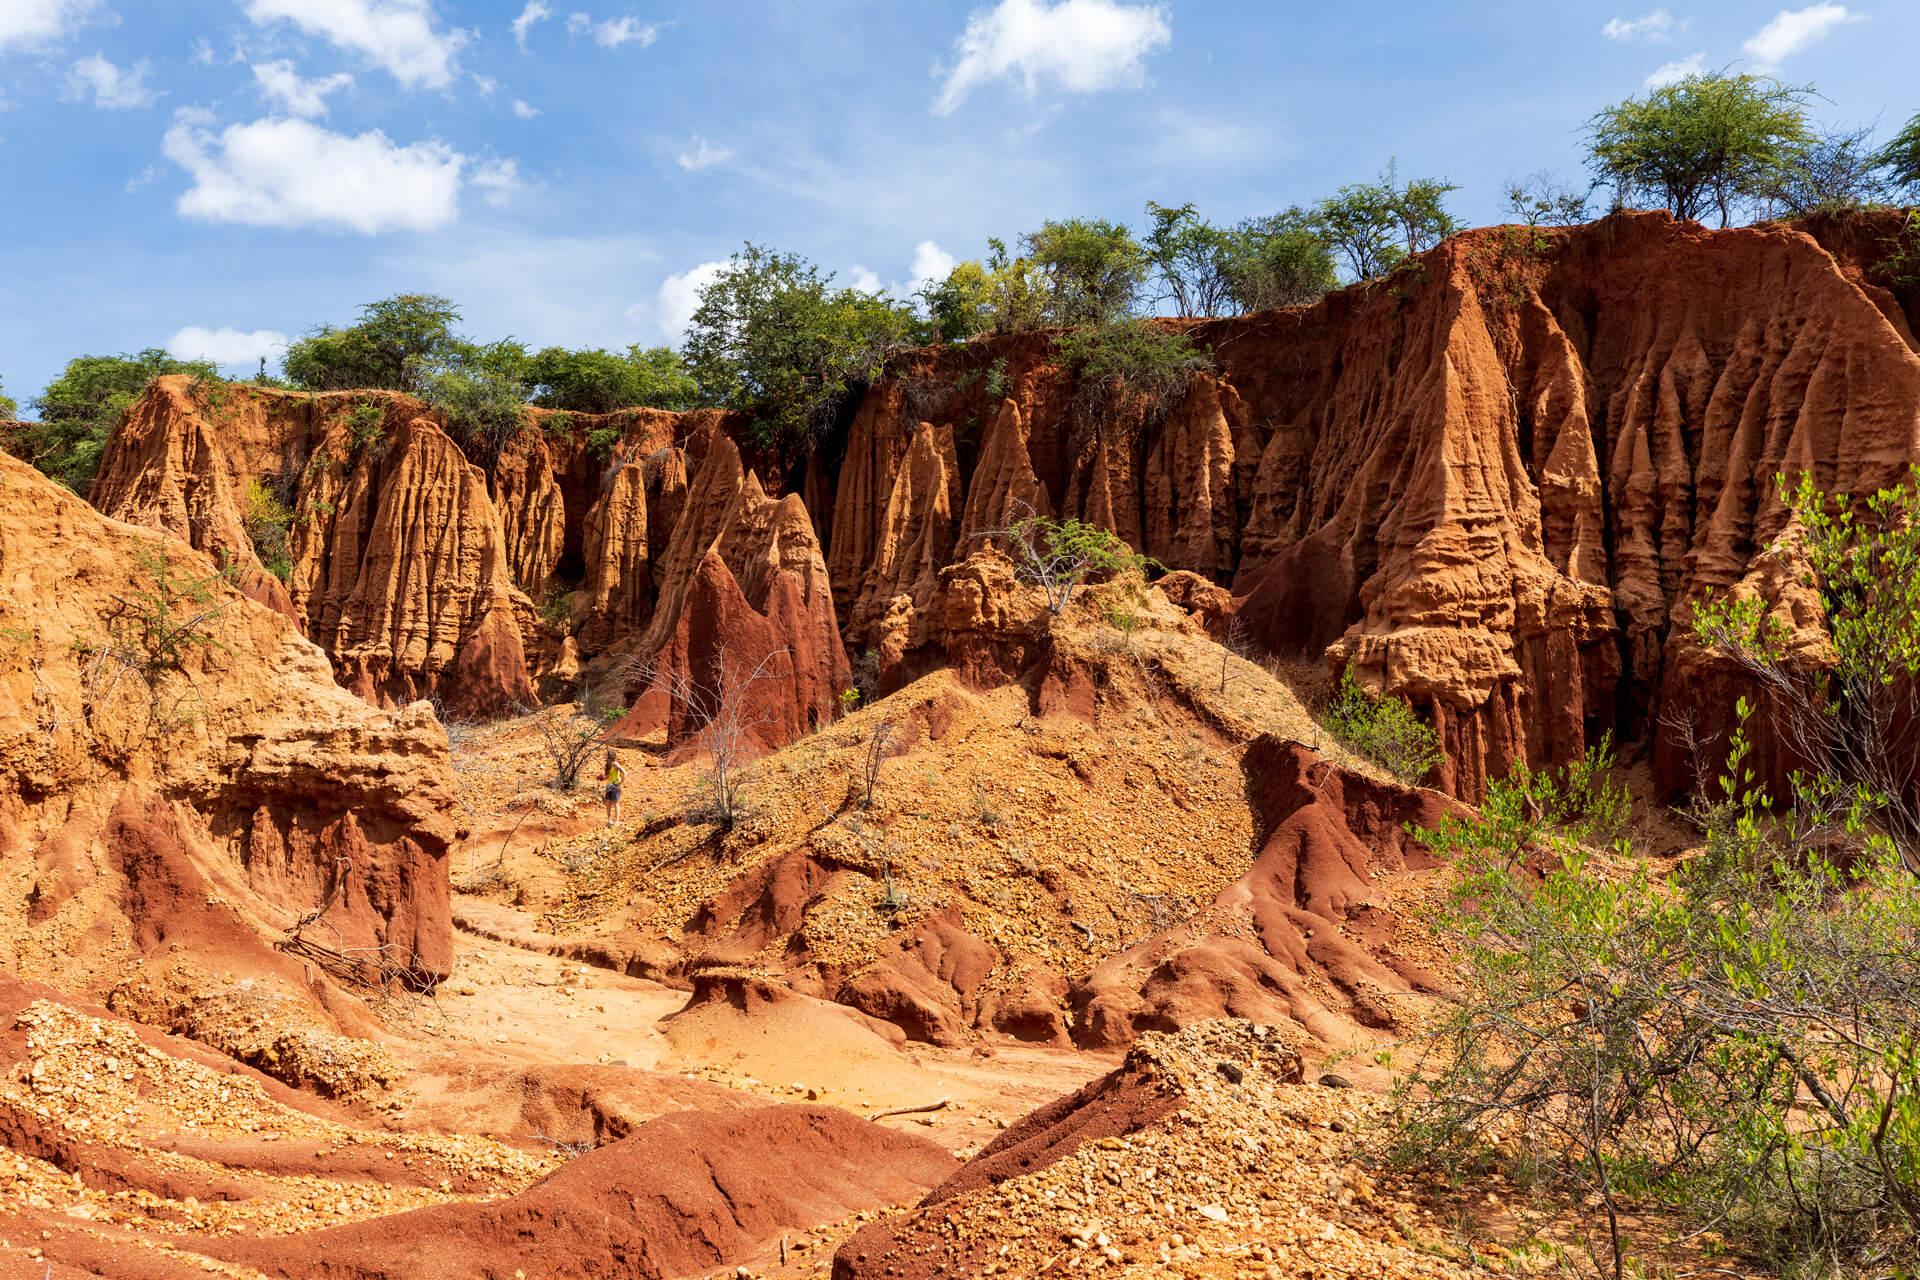 Ethiopia-trip-adventure-nature-canyon-Yabelo-city-forest-wildlife